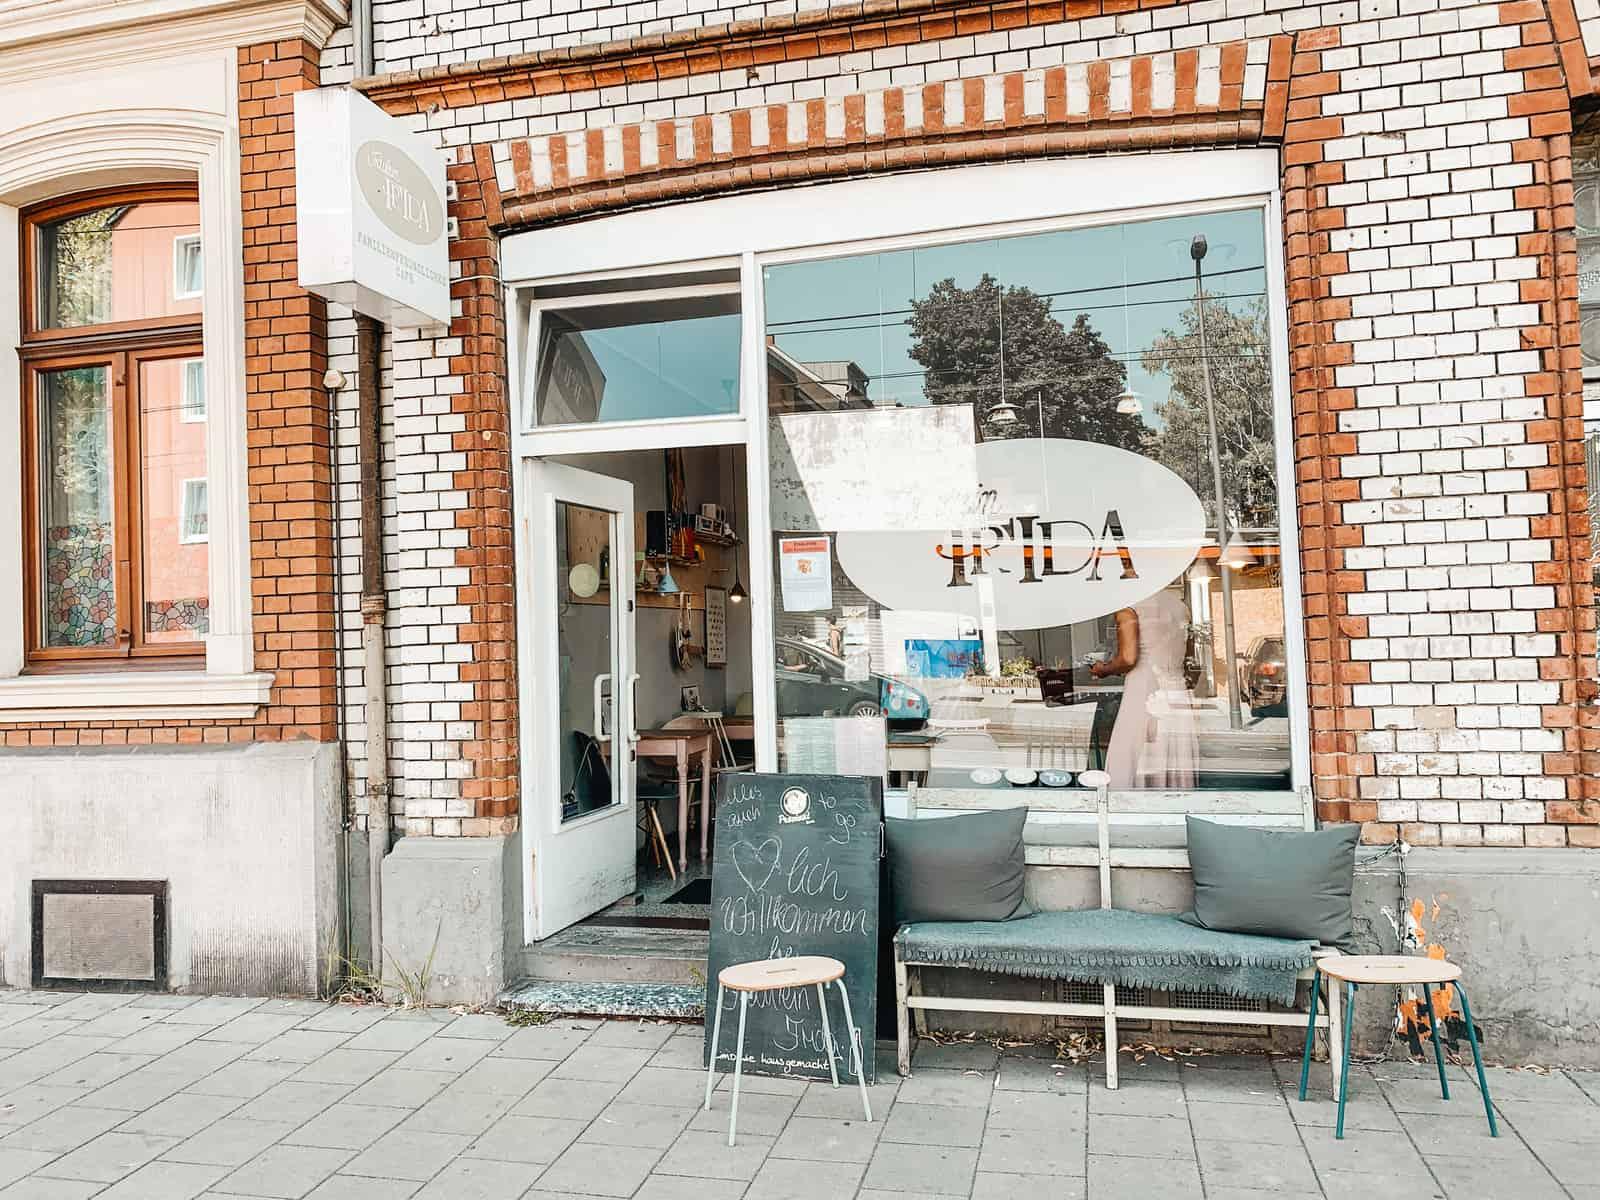 FAMILY-FRIENDLY CAFÉ FRÄULEIN FRIDA IN COLOGNE